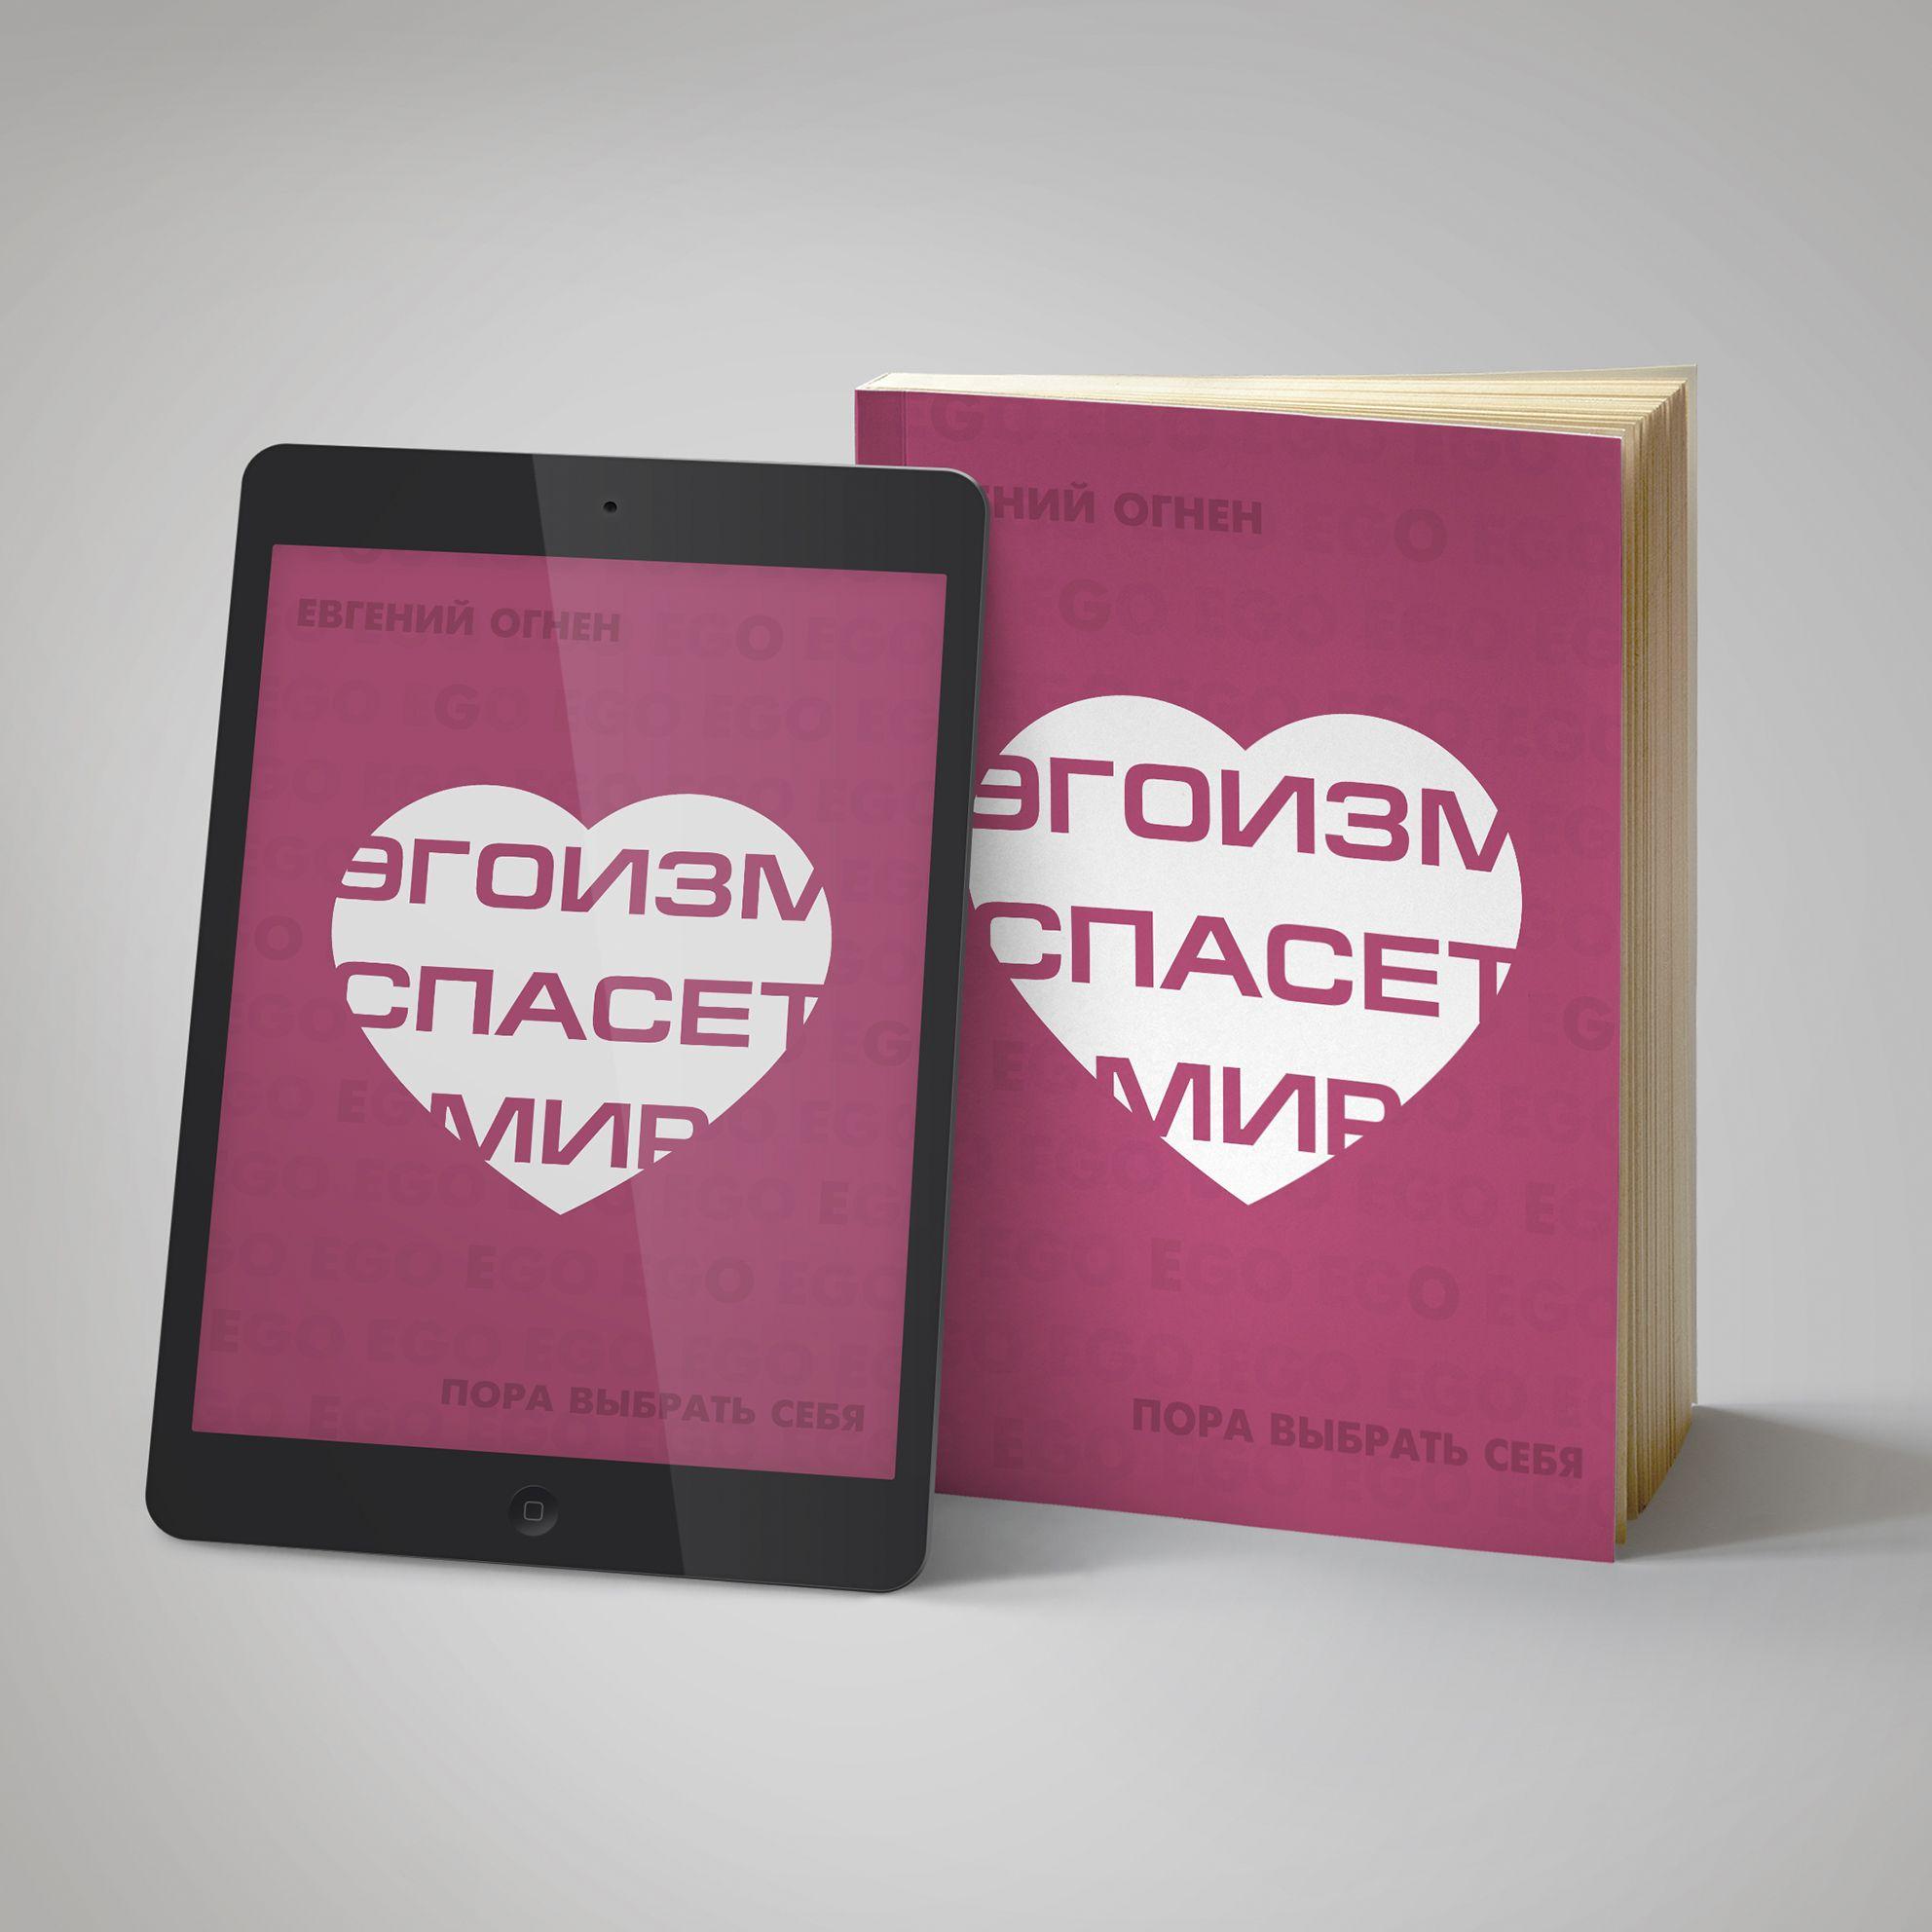 Обложка на книгу - Эгоизм спасет мир! - дизайнер mkravchenko